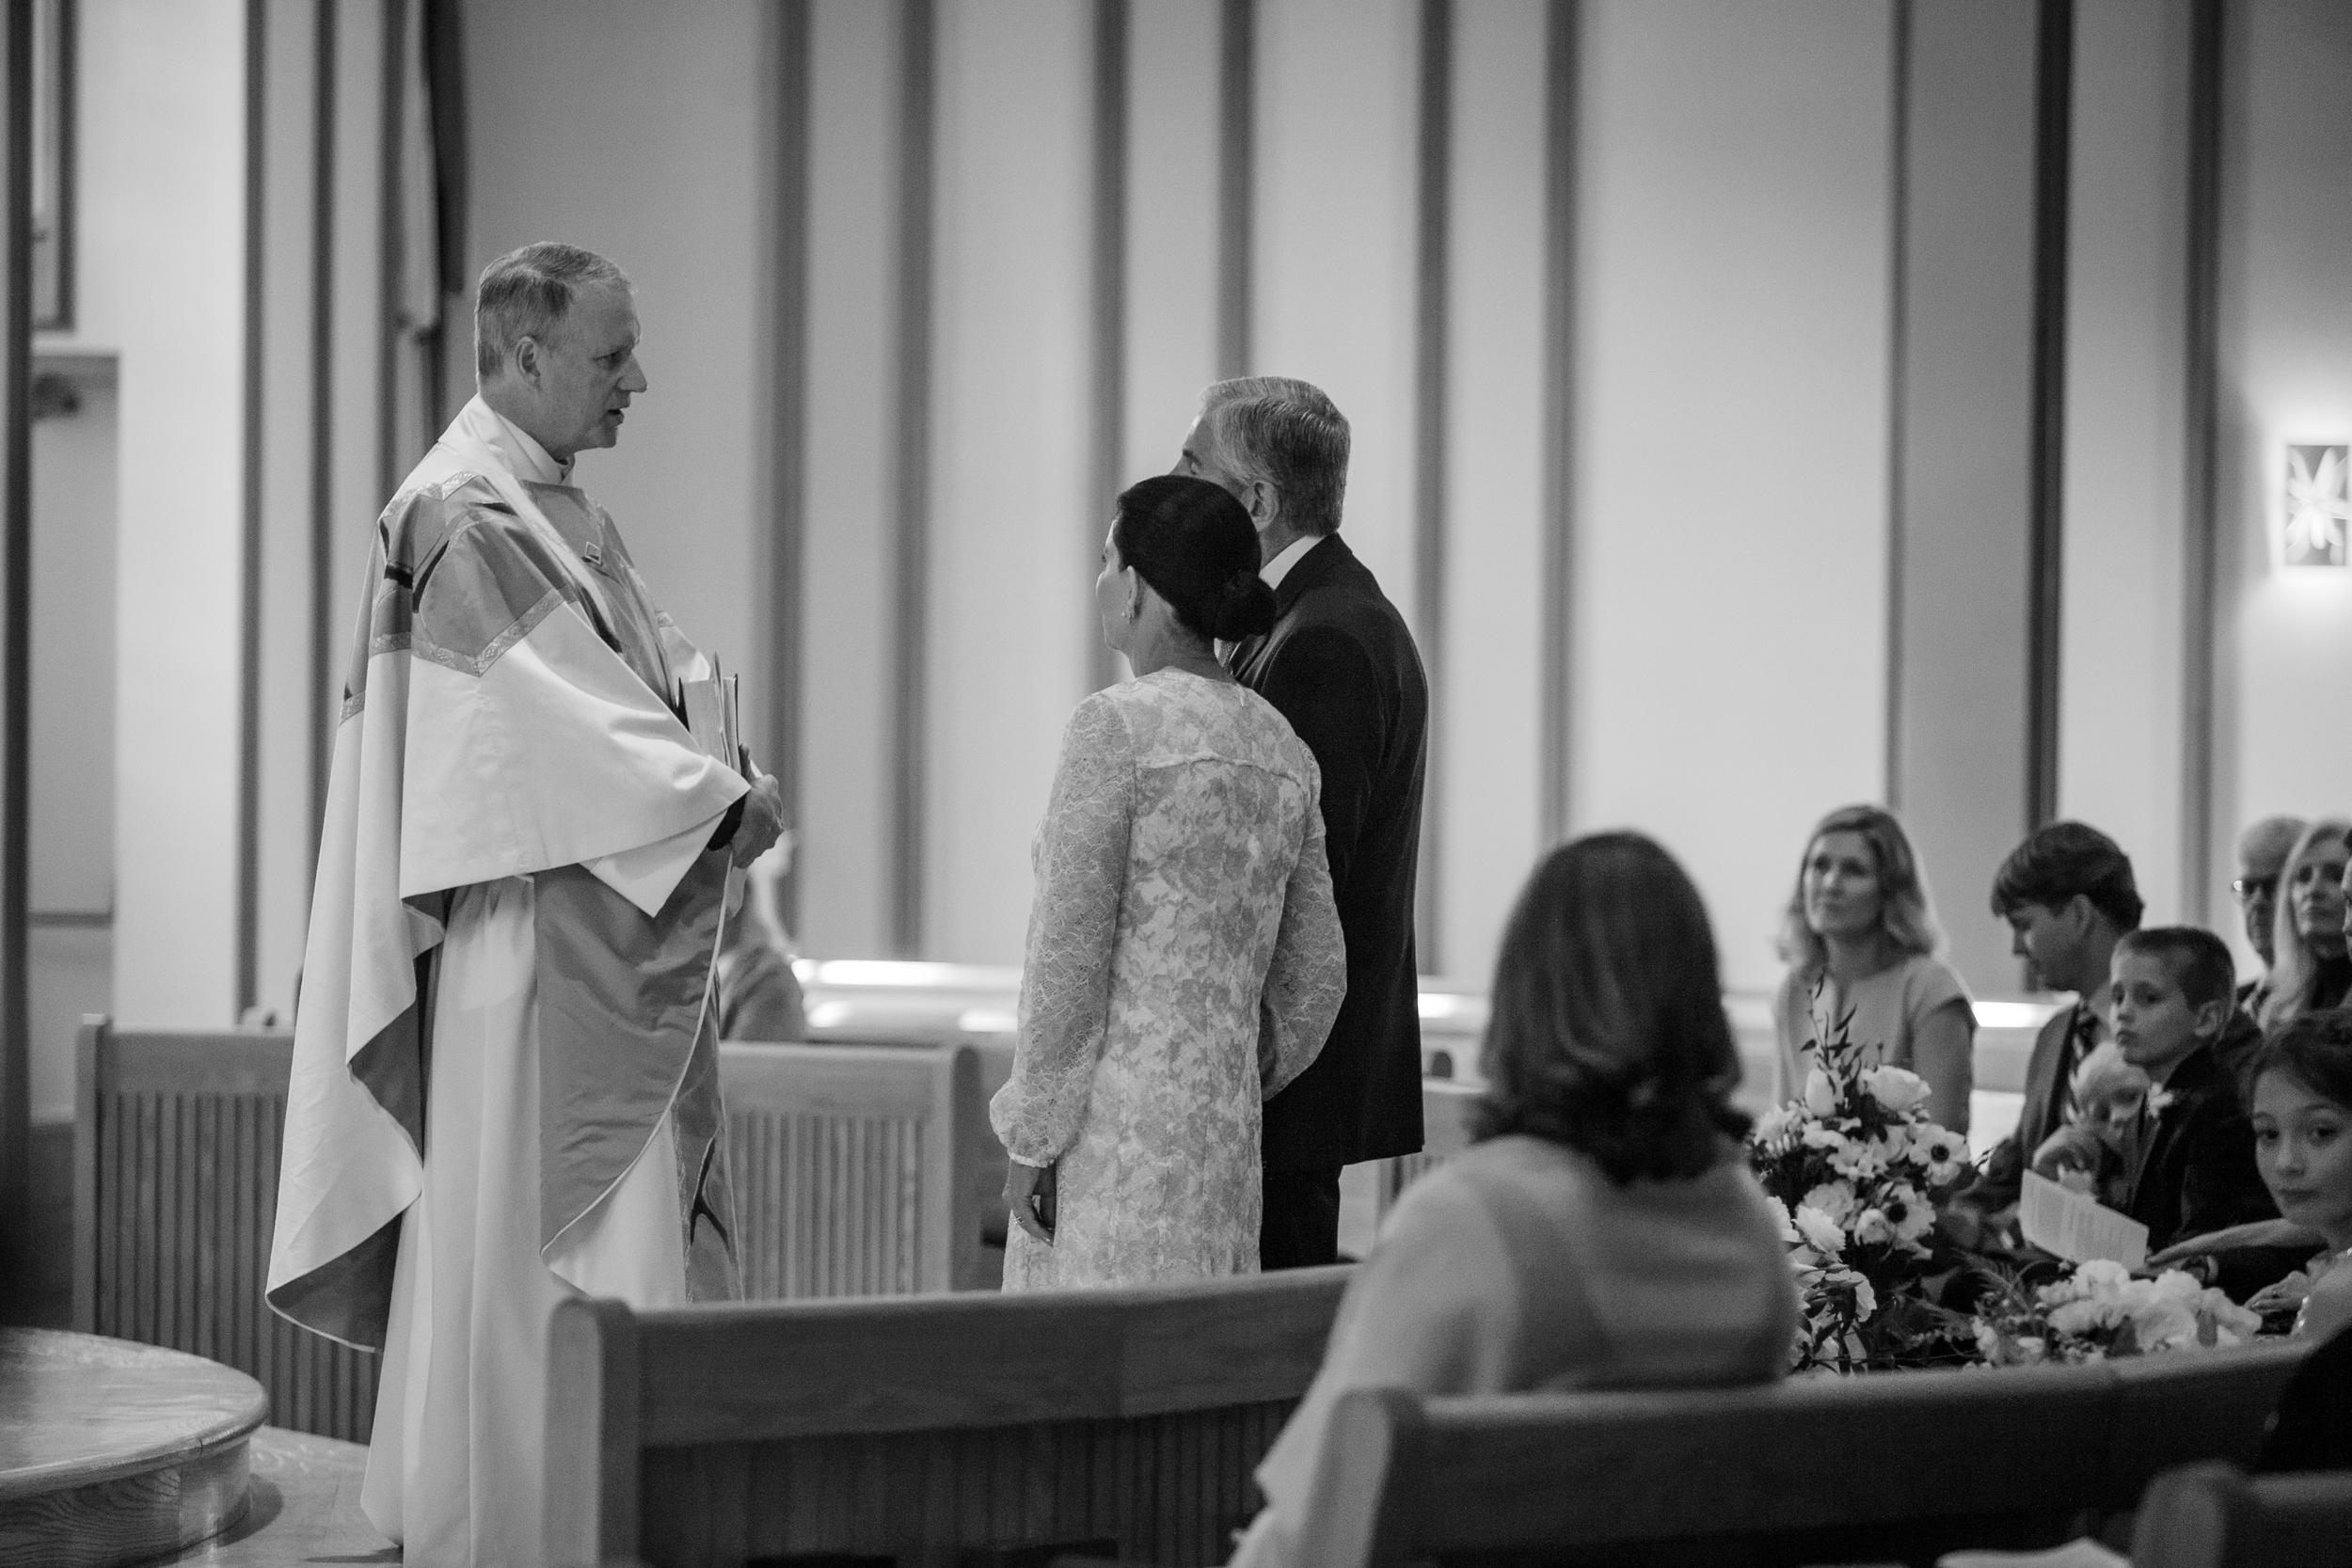 028 - bride & groom at altar.jpg